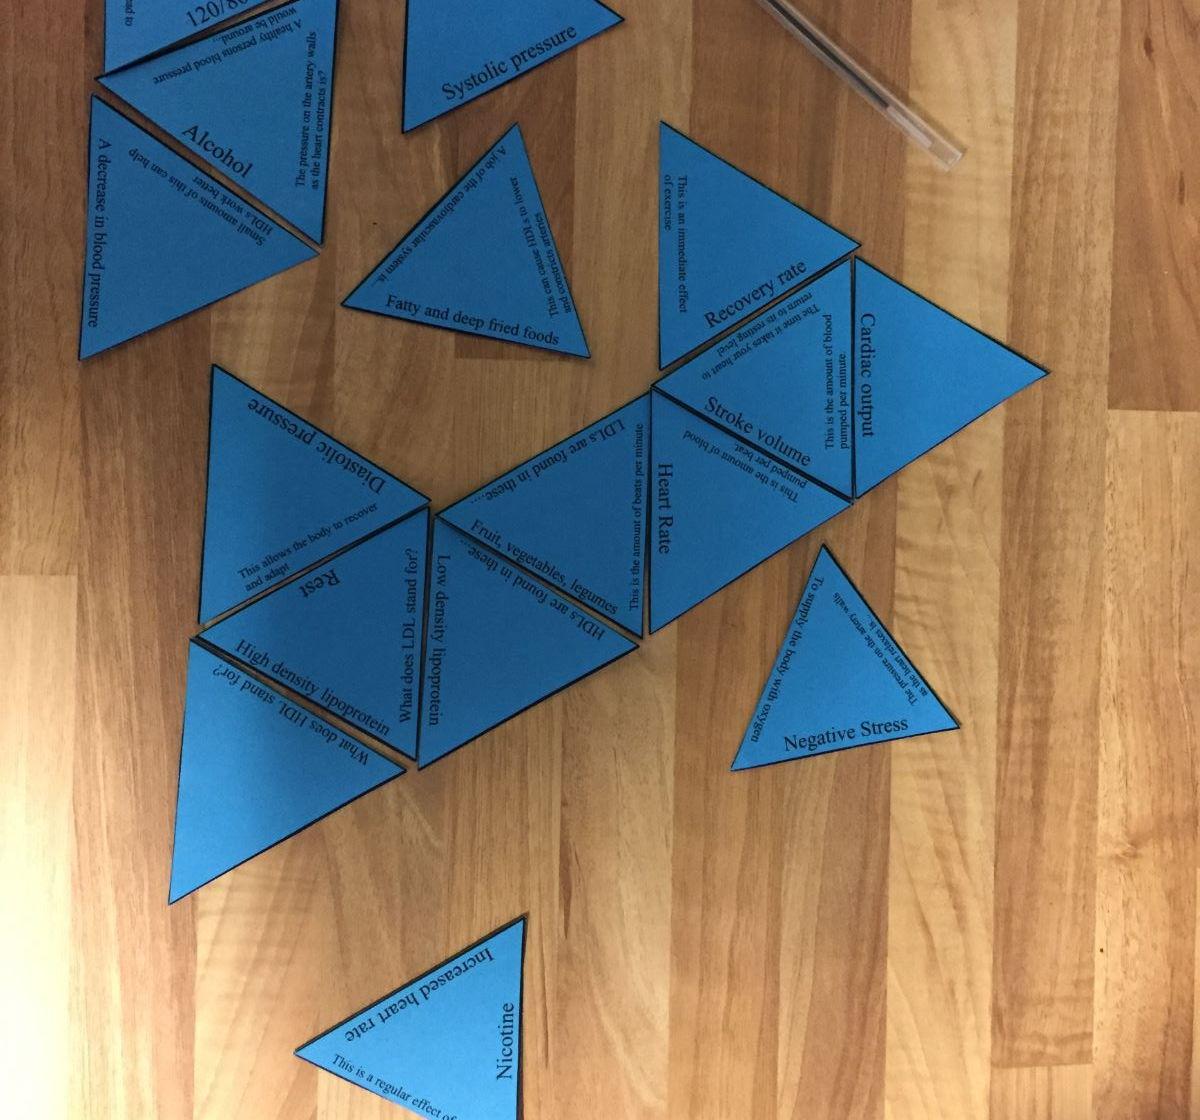 GCSE PE AQA 9-1 FULL PAPER 2 Tarsia Triangle Puzzle Set